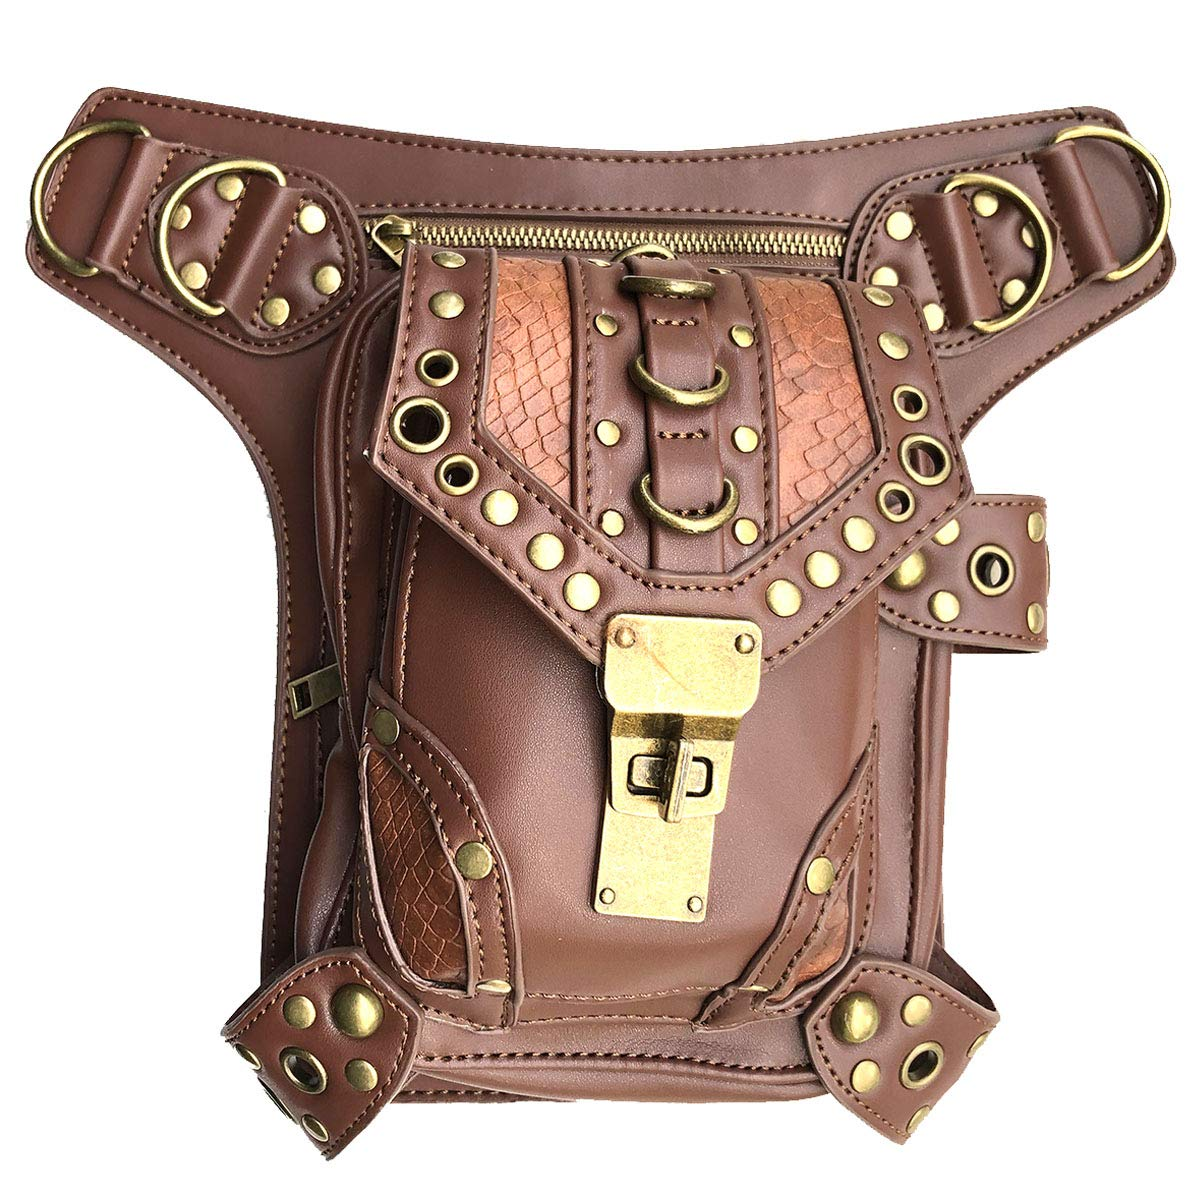 Steampunk Waist bag Fanny Pack Retro Fashion Gothic Casual Leather Shoulder Crossbody Messenger Bags Punk Rock Thigh Leg Hip Holster Purse Pouch Travel Hiking Sport Chain Bags for Women Men